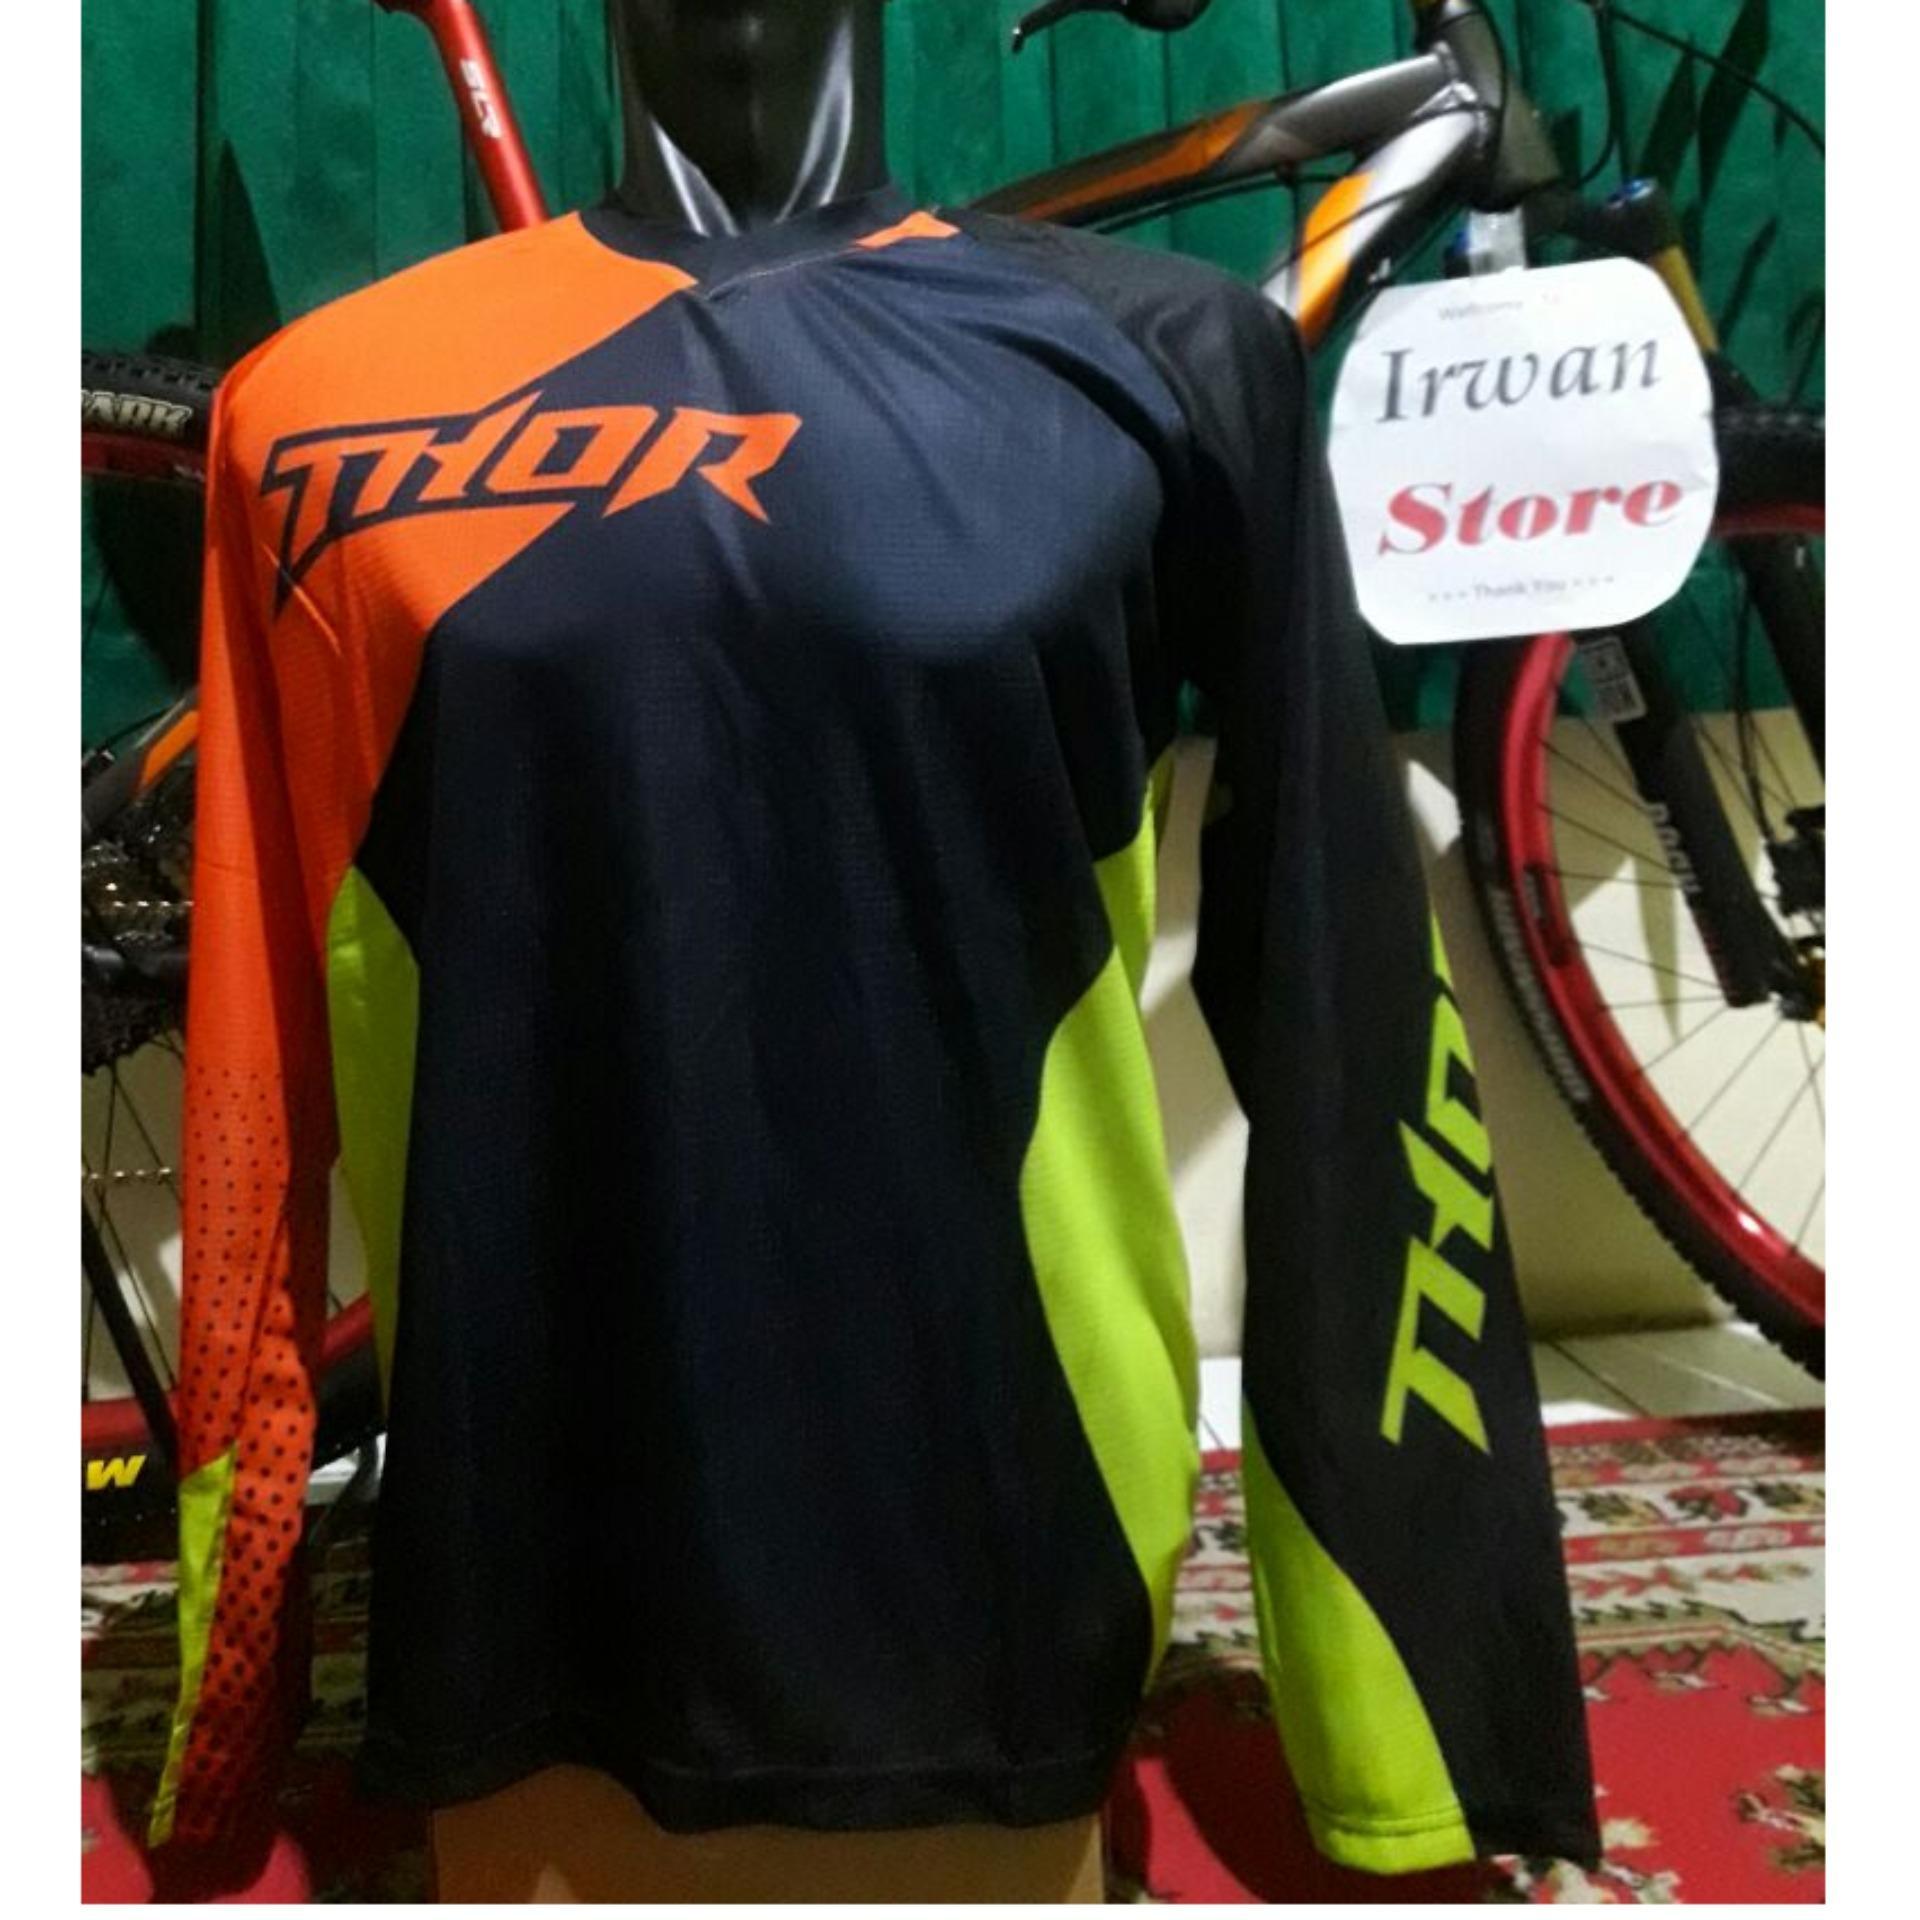 Jual Beli Baju Jersey Sepeda Downhill Motocross Thor Baru Indonesia